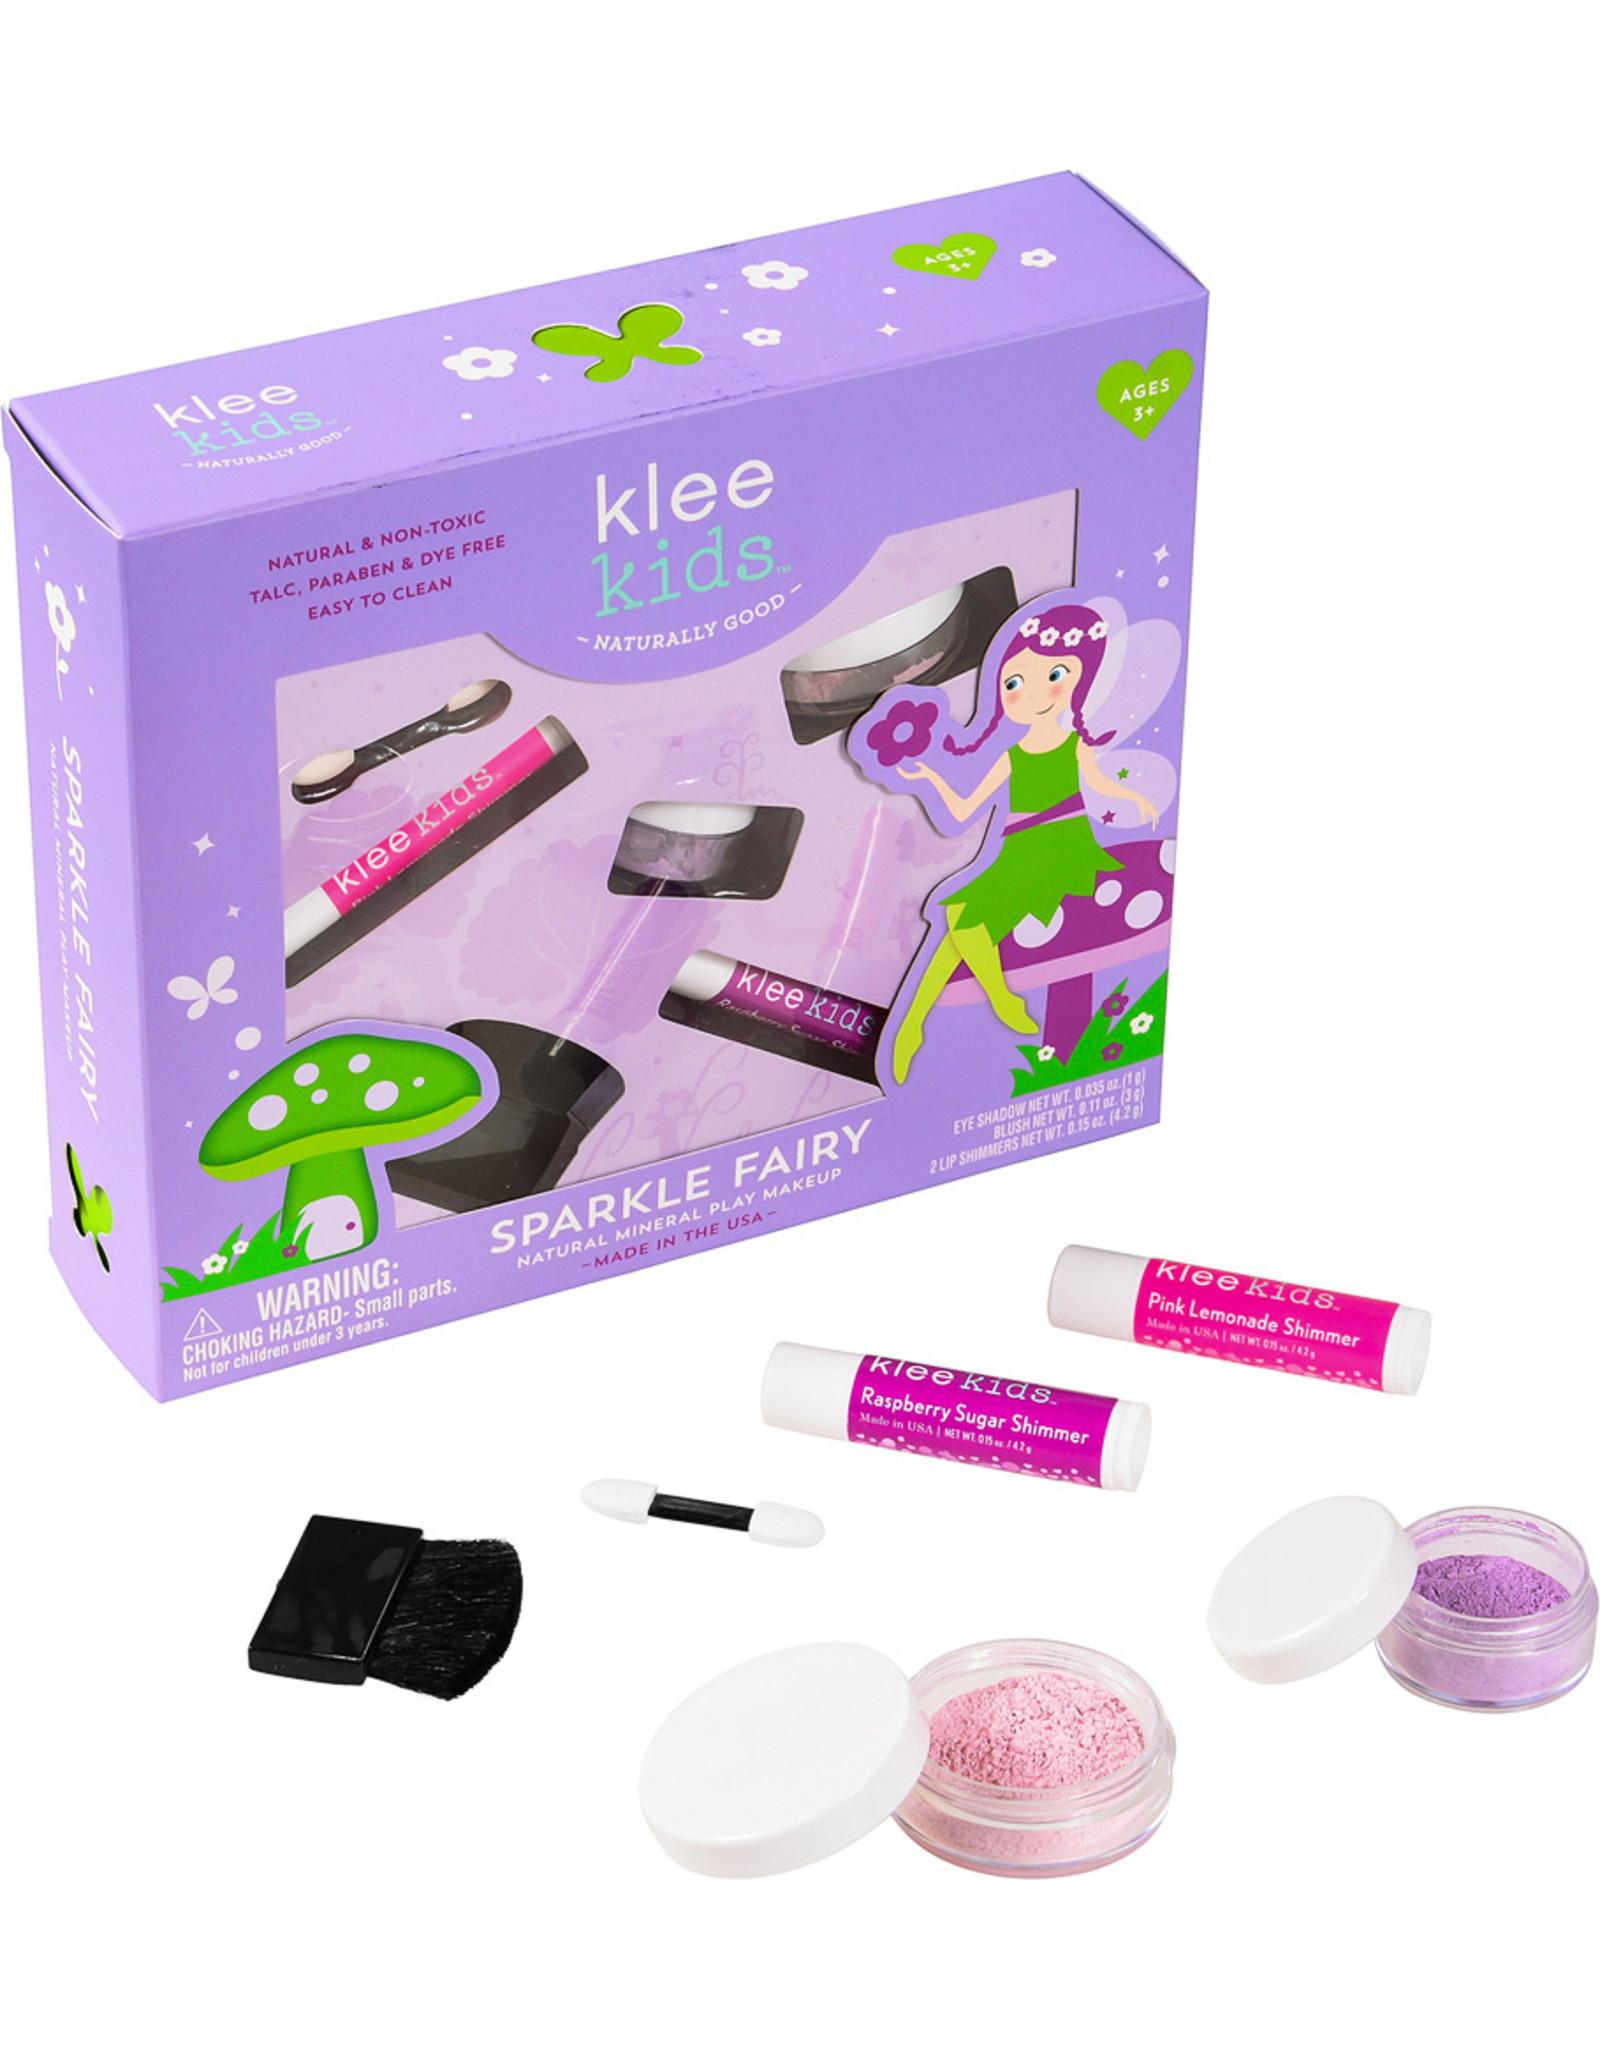 Klee Naturals Sparkle Fairy Natural Play Makeup Kit